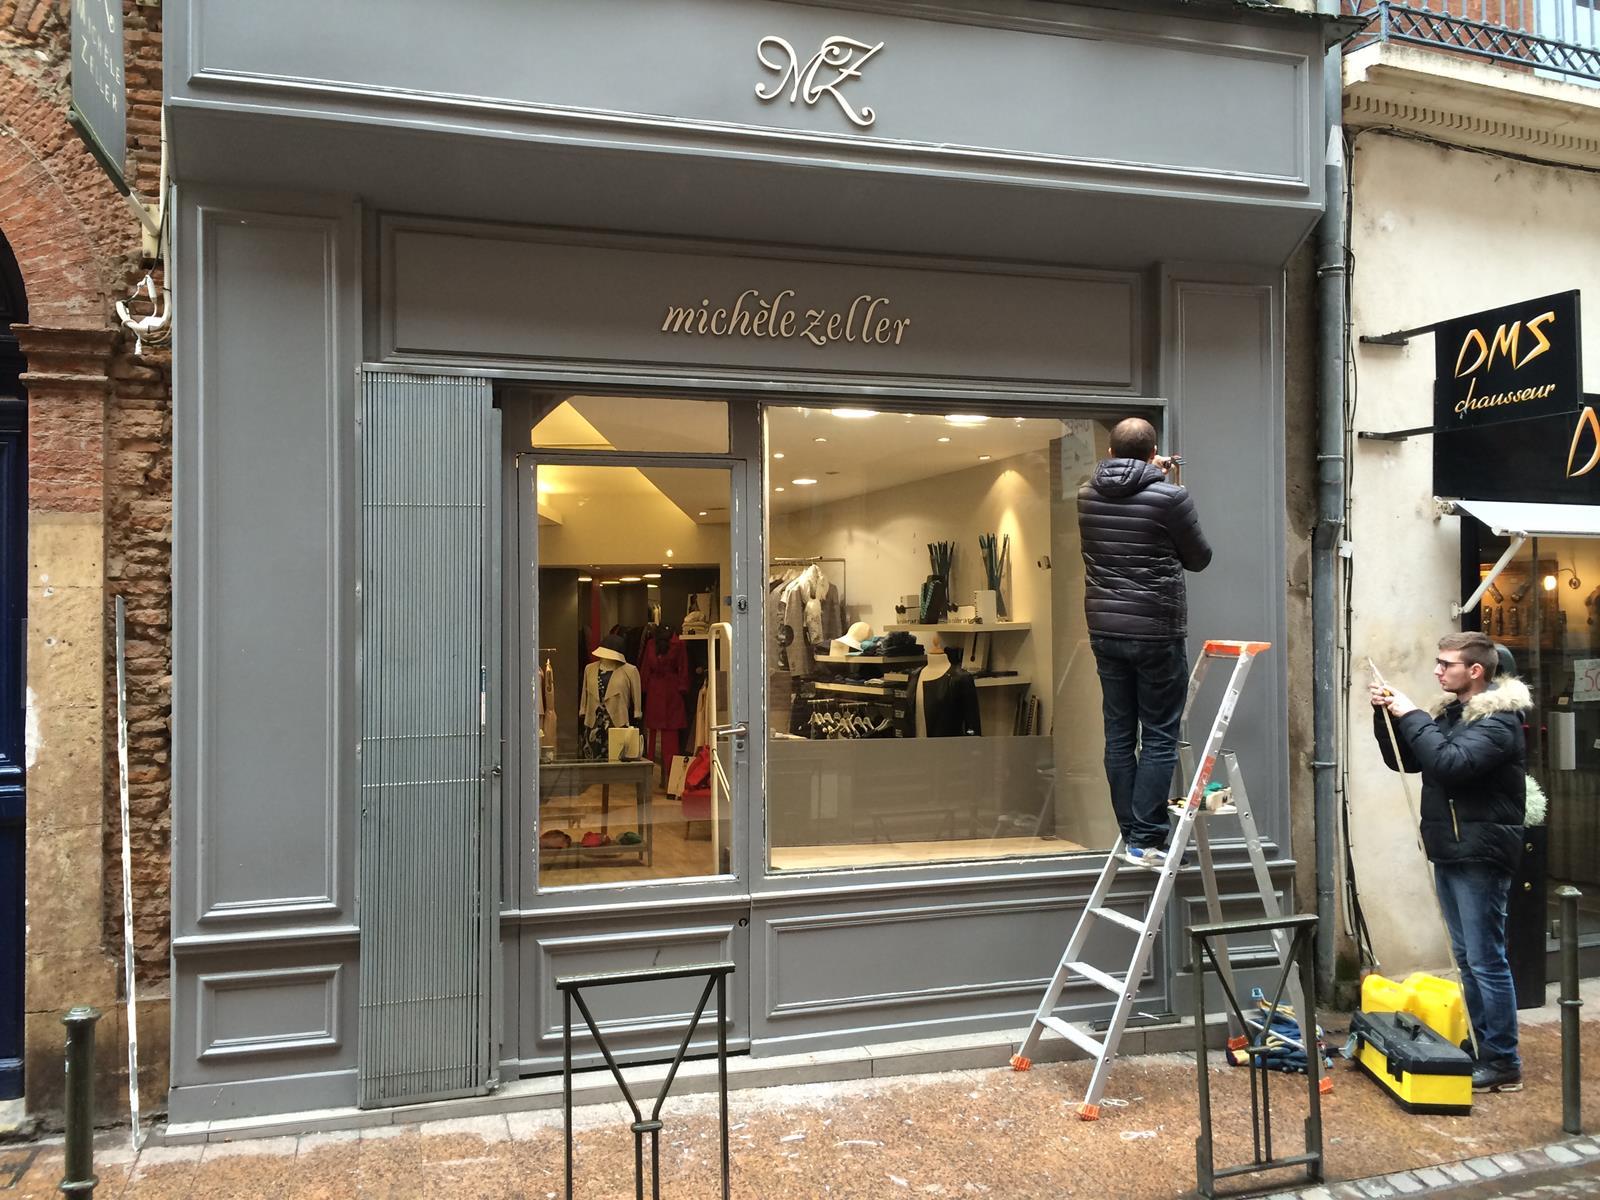 images2vitrine-boutique-3.jpg